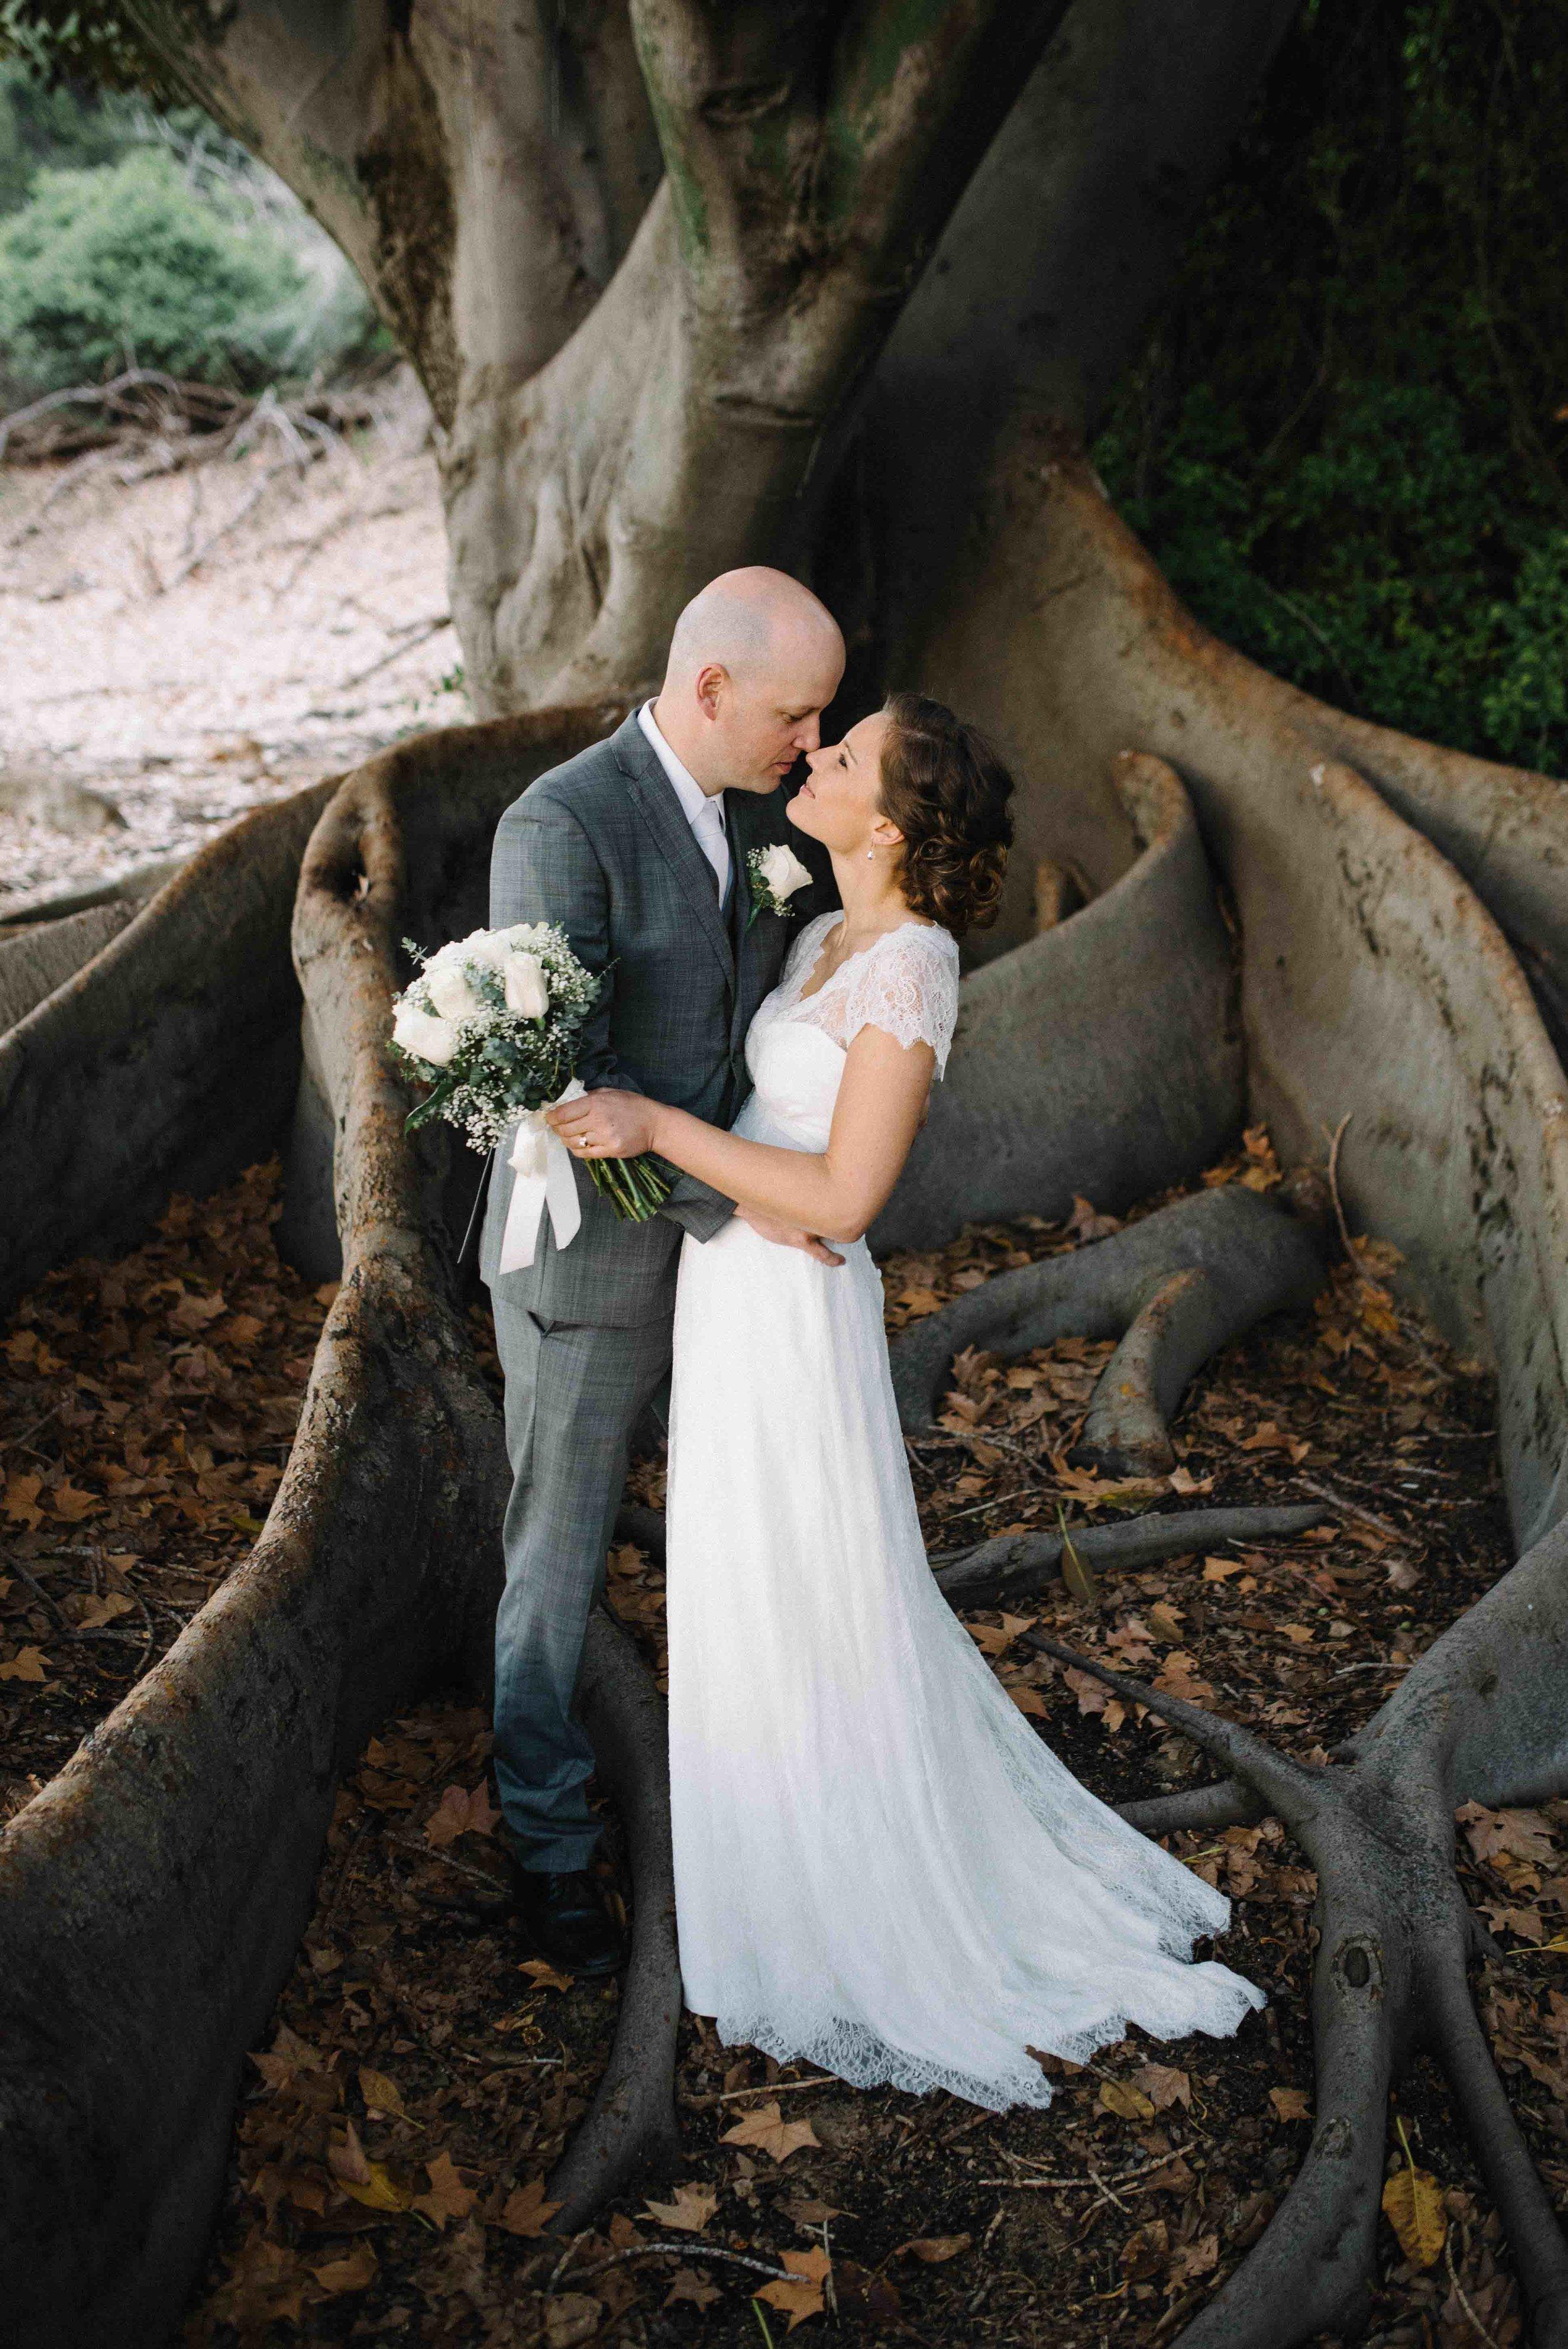 63-fig wedding tree perth photographer.jpg